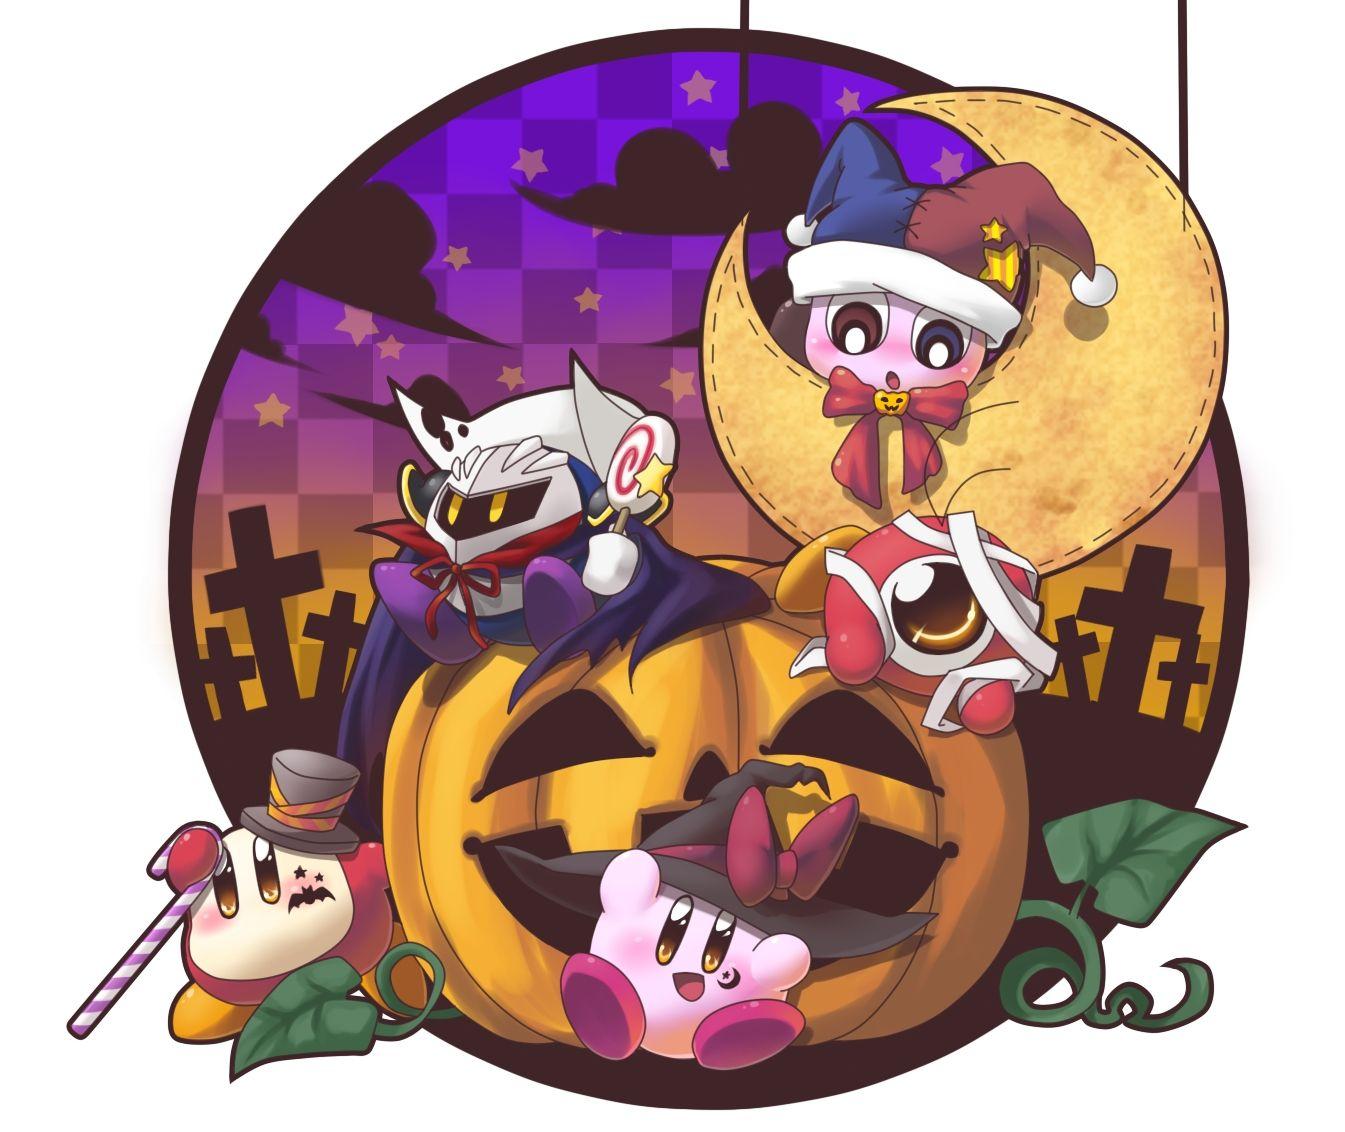 Pin By Marie Brandt On Hallowe En All Year Long 3 Kirby Kirby Character Kirby Art